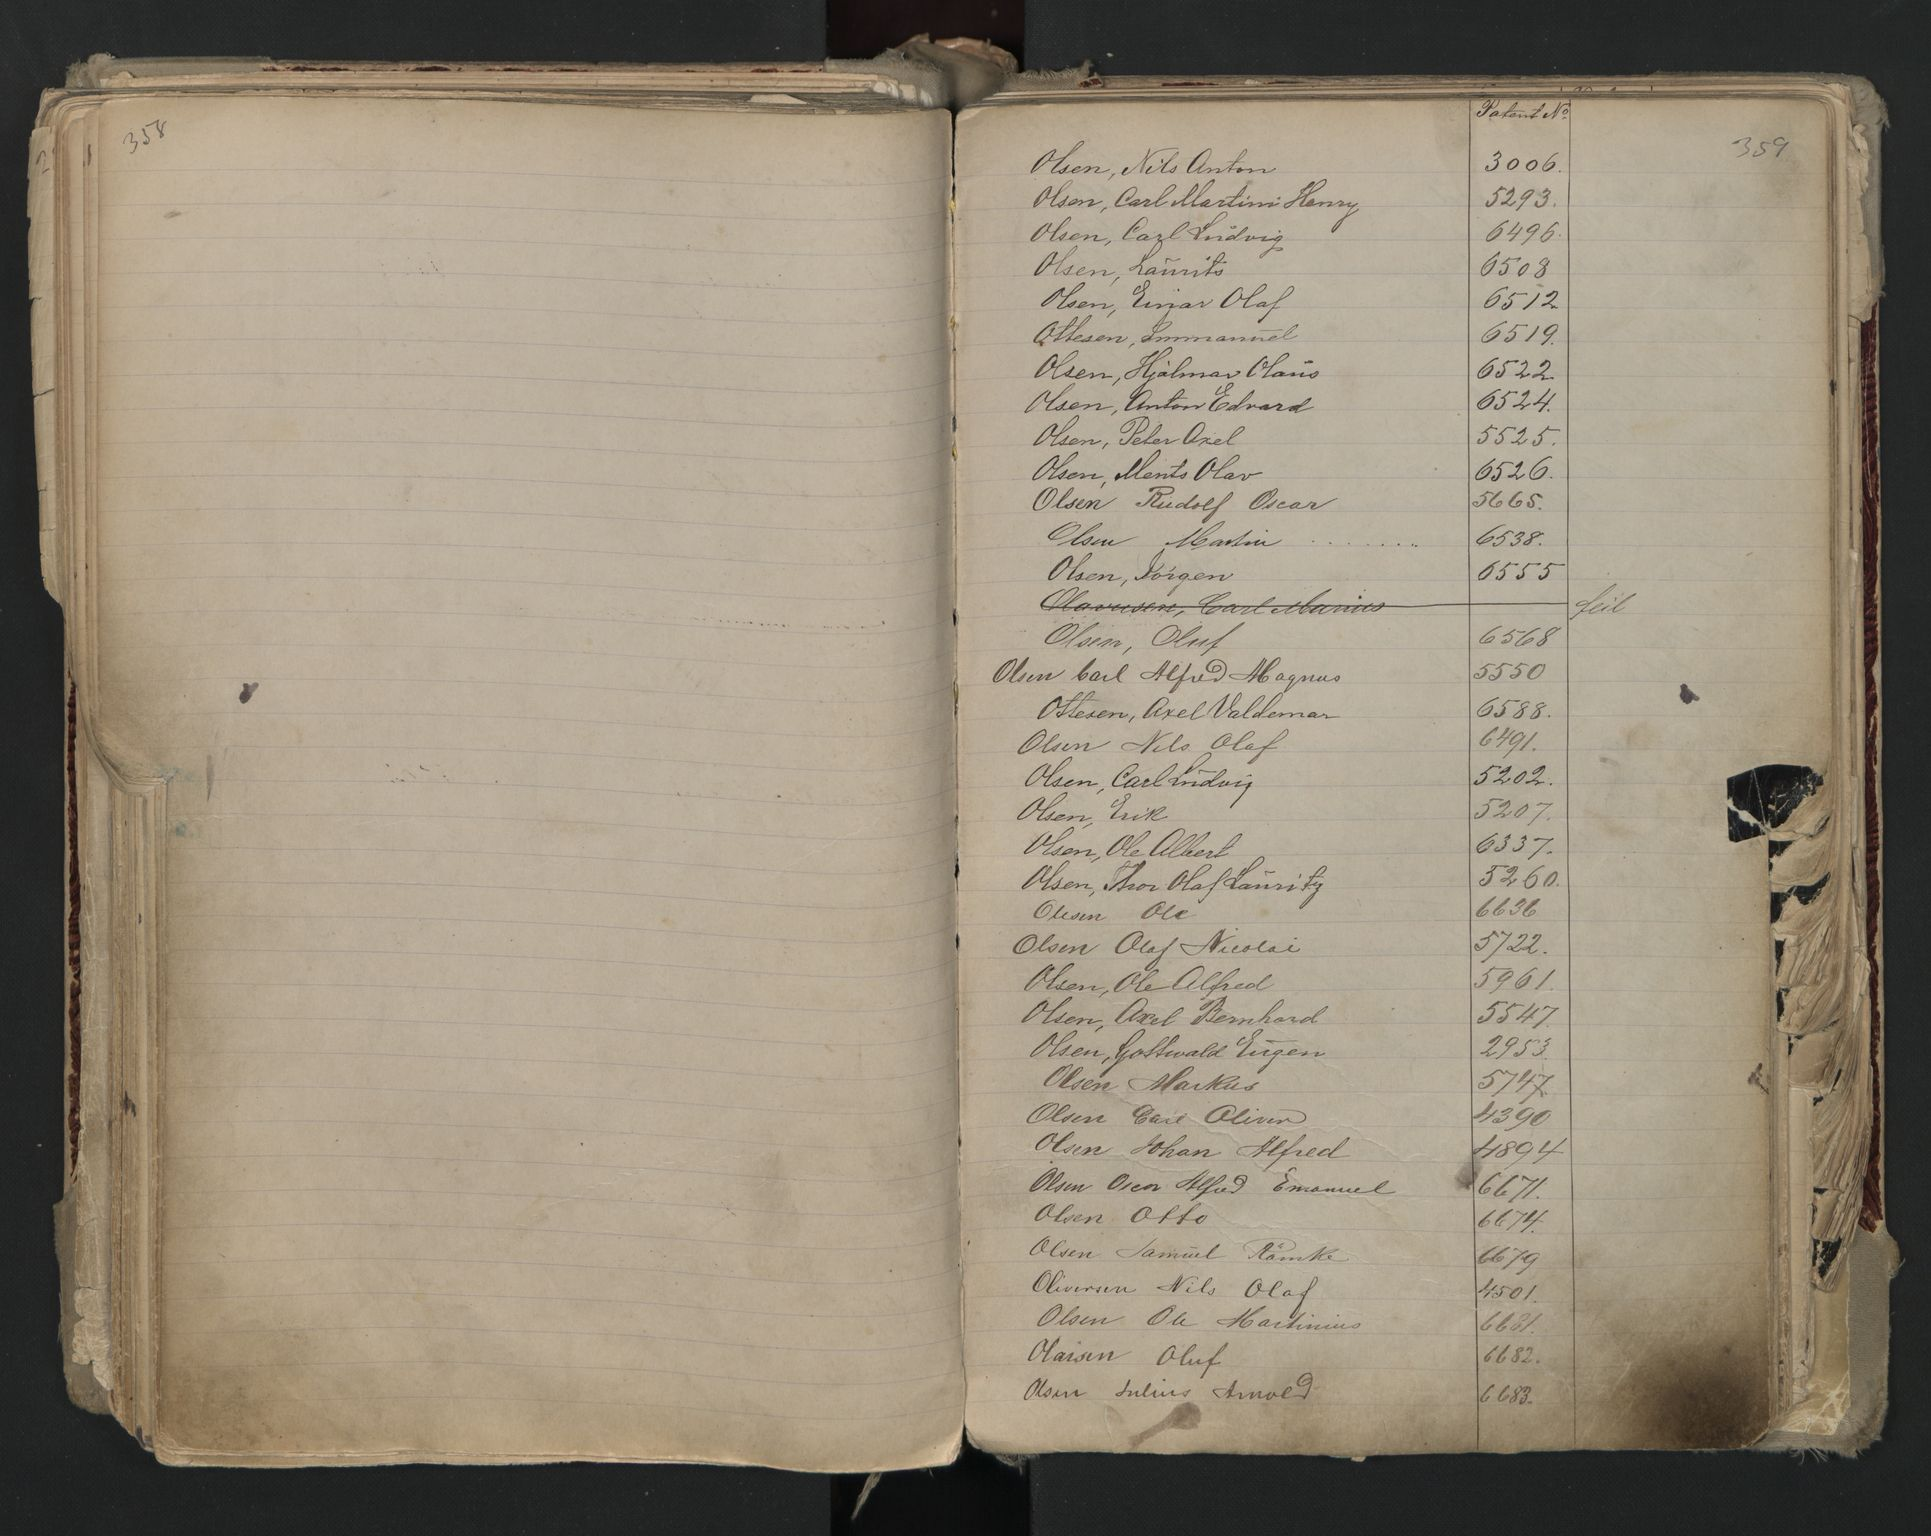 SAO, Oslo sjømannskontor, F/Fa/L0002: Register for Kristiania krets, 1866-1930, s. 358-359